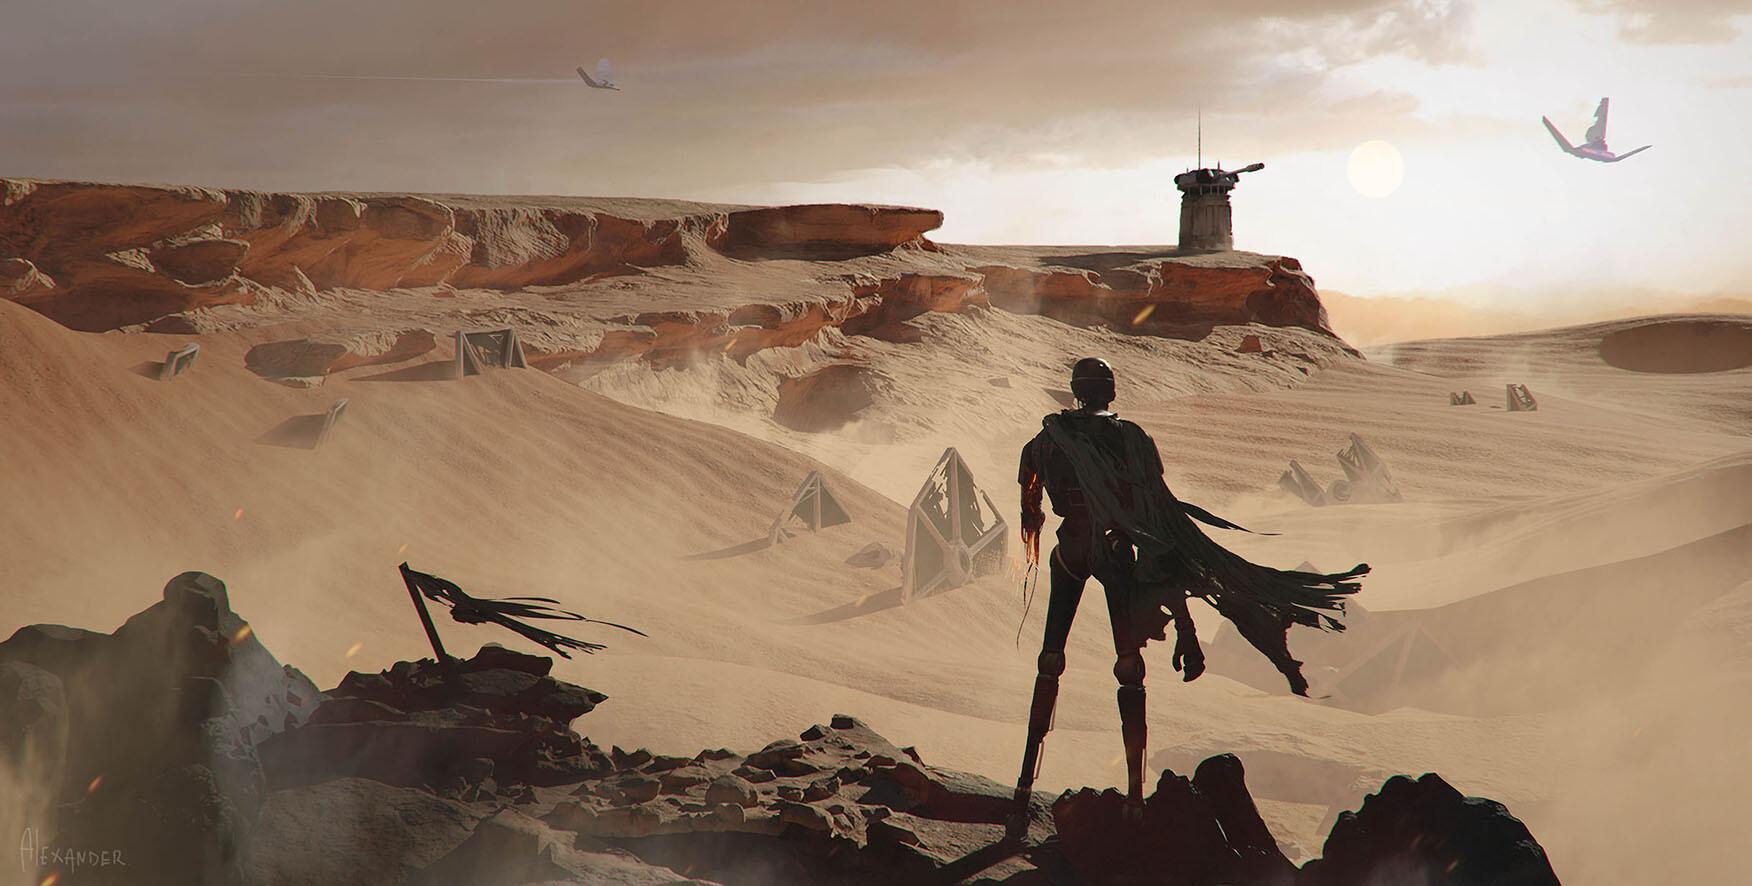 The Sci-Fi Themed Sketches of Joseba Alexander